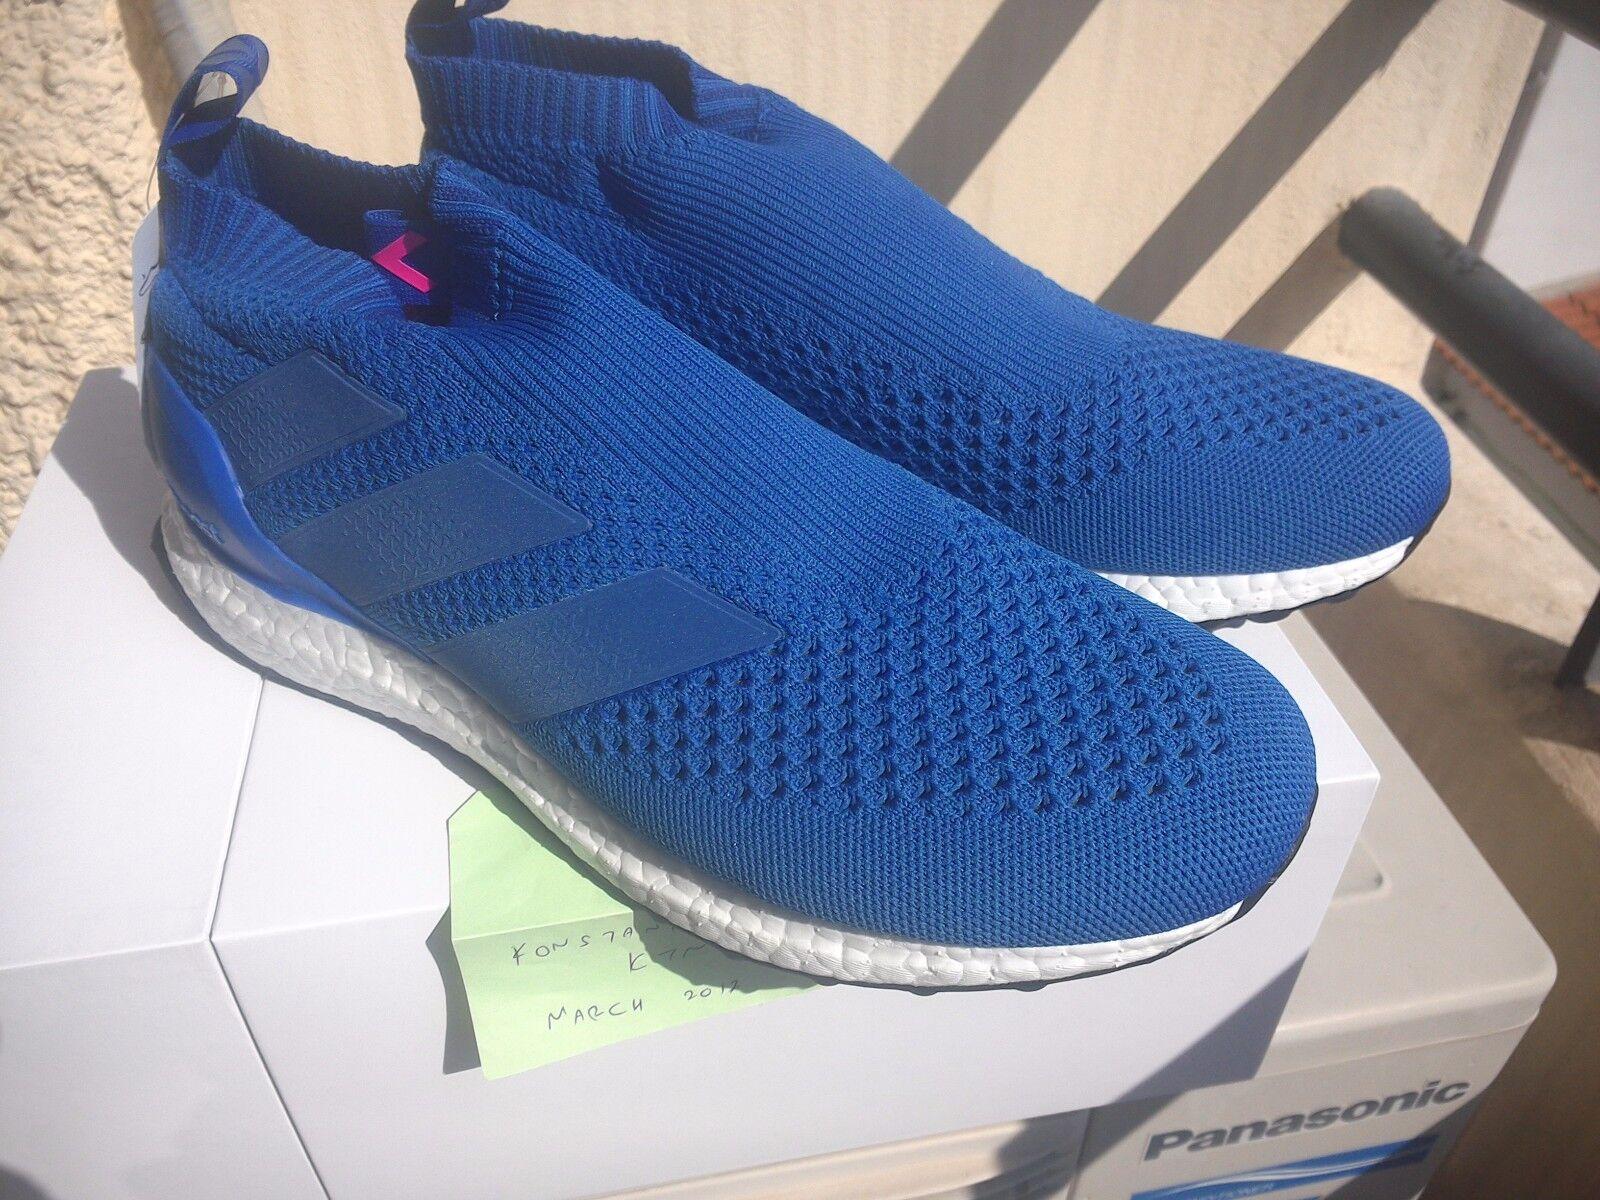 Adidas ACE 17 Purecontrol Ultra Boost bleu BY9090 LTD US 10.5  (SEND OFFERS)